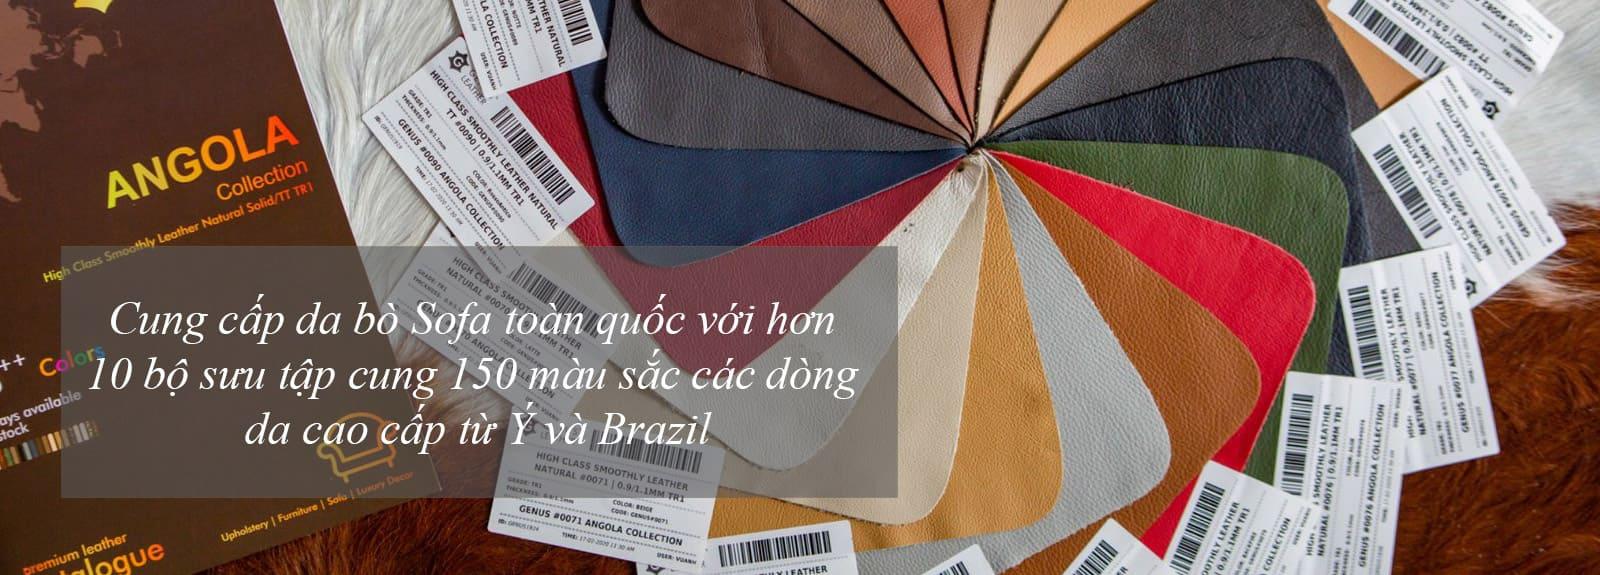 Banner Da bò sofa nguyên liệu